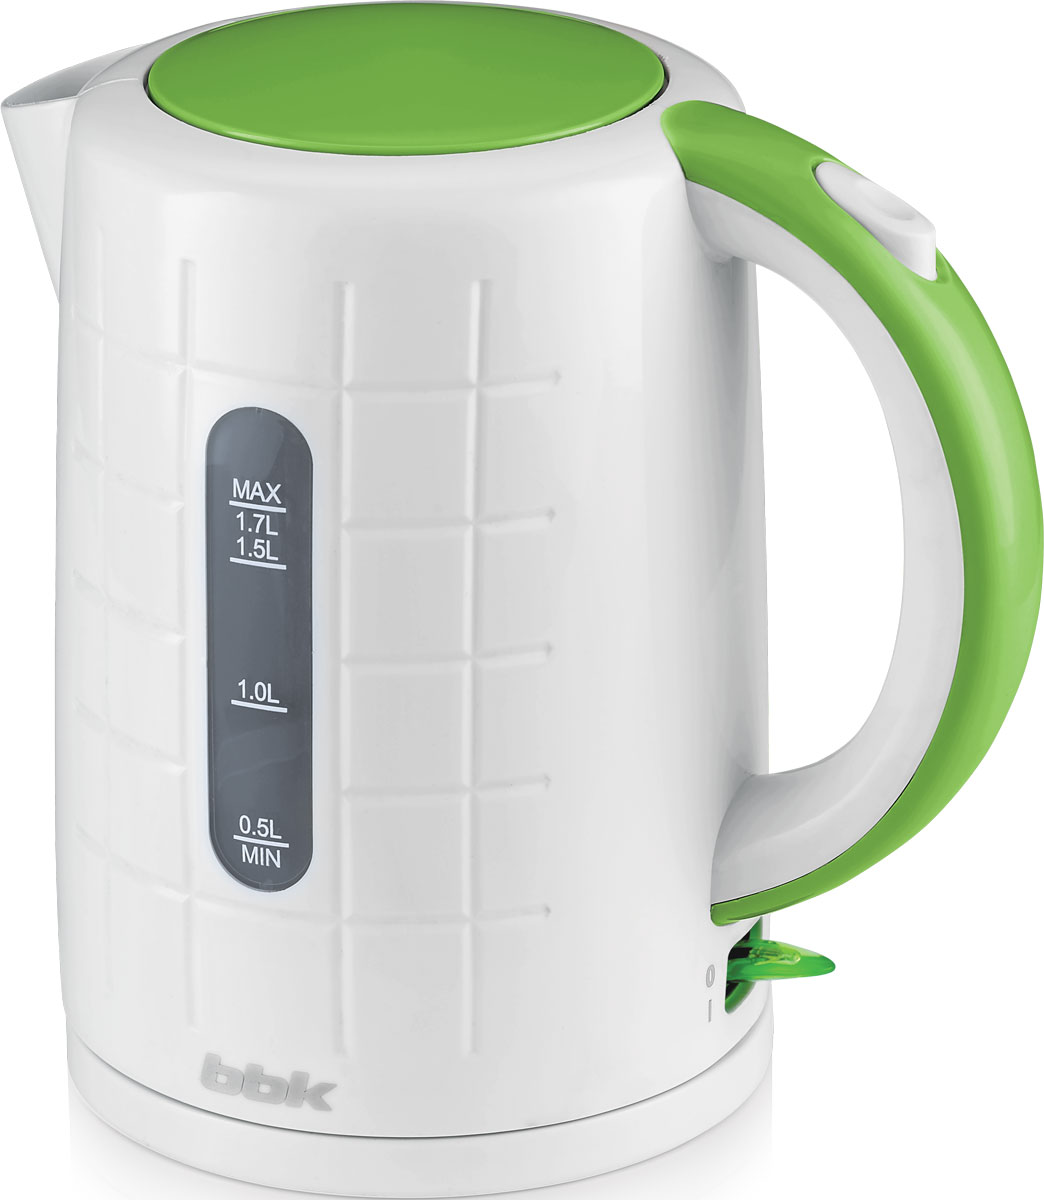 BBK EK1703P, White Green электрический чайник